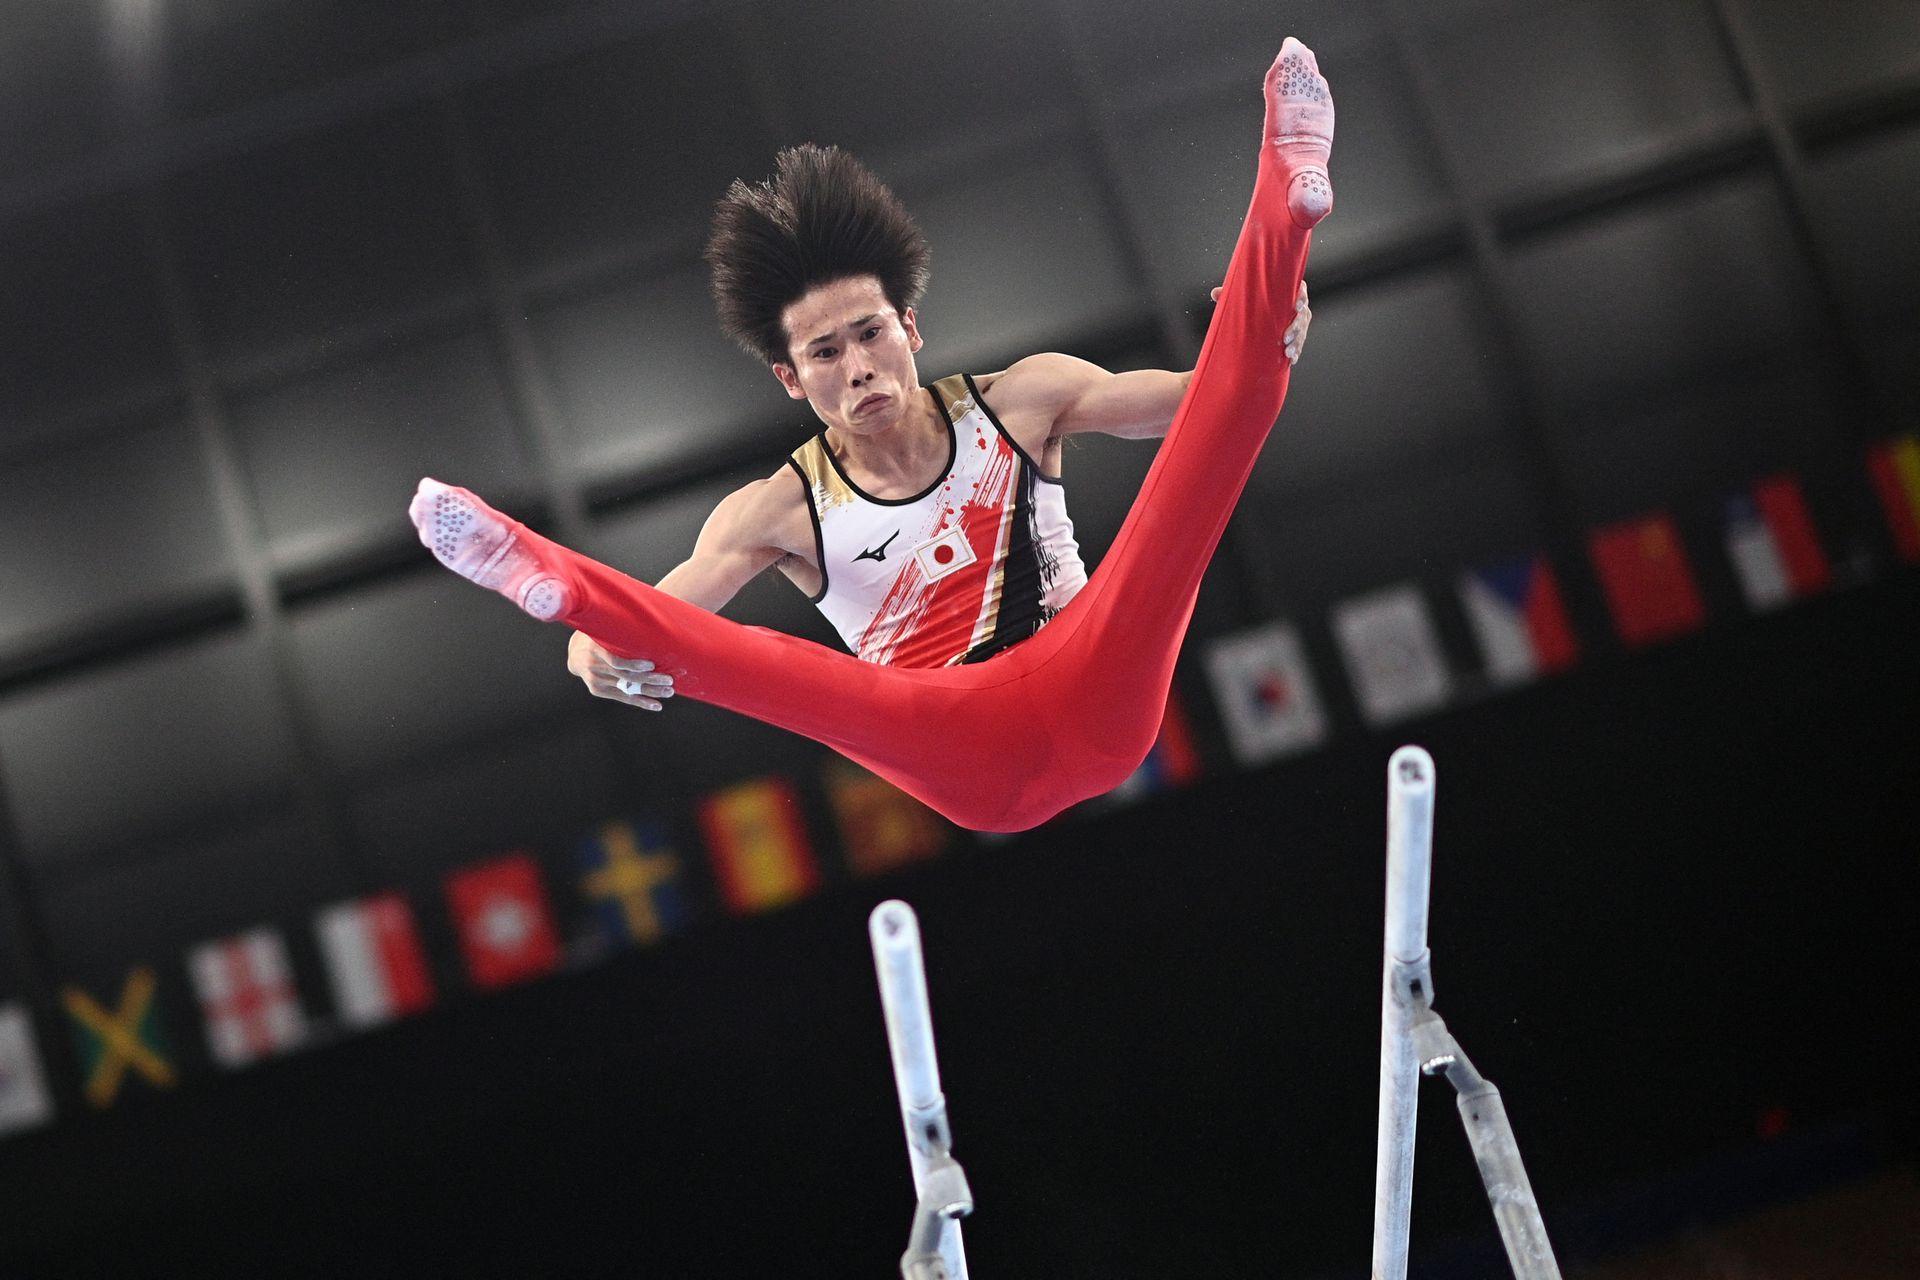 Kazuma Kaya, de Japón, compite en la final de gimnasia artística masculina